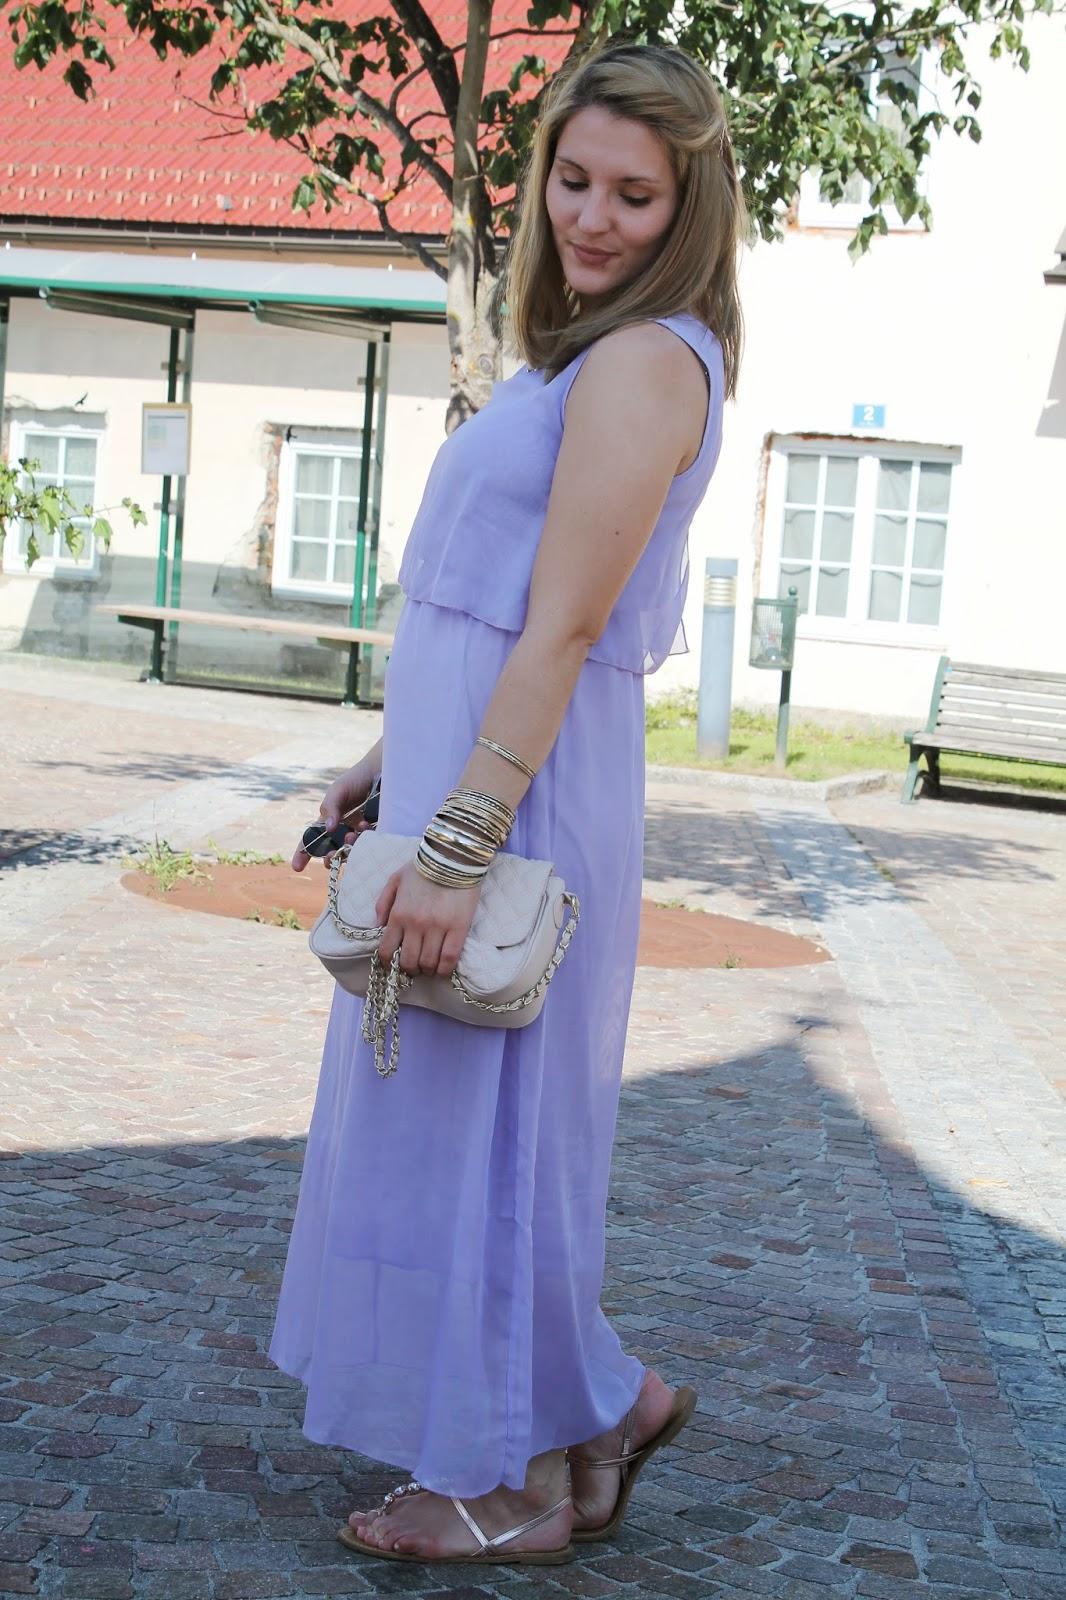 Fashionblogger Austria / Österreich / Deutsch / German / Kärnten / Carinthia / Klagenfurt / Köttmannsdorf / Spring Look / Classy / Edgy / Summer / Summer Style 2014 / Summer Look / Fashionista Look / Oasap / Maxi Dress / Maxi Kleid / Asos / Persunmall / Tally Weijl / essence / Ray Ban /